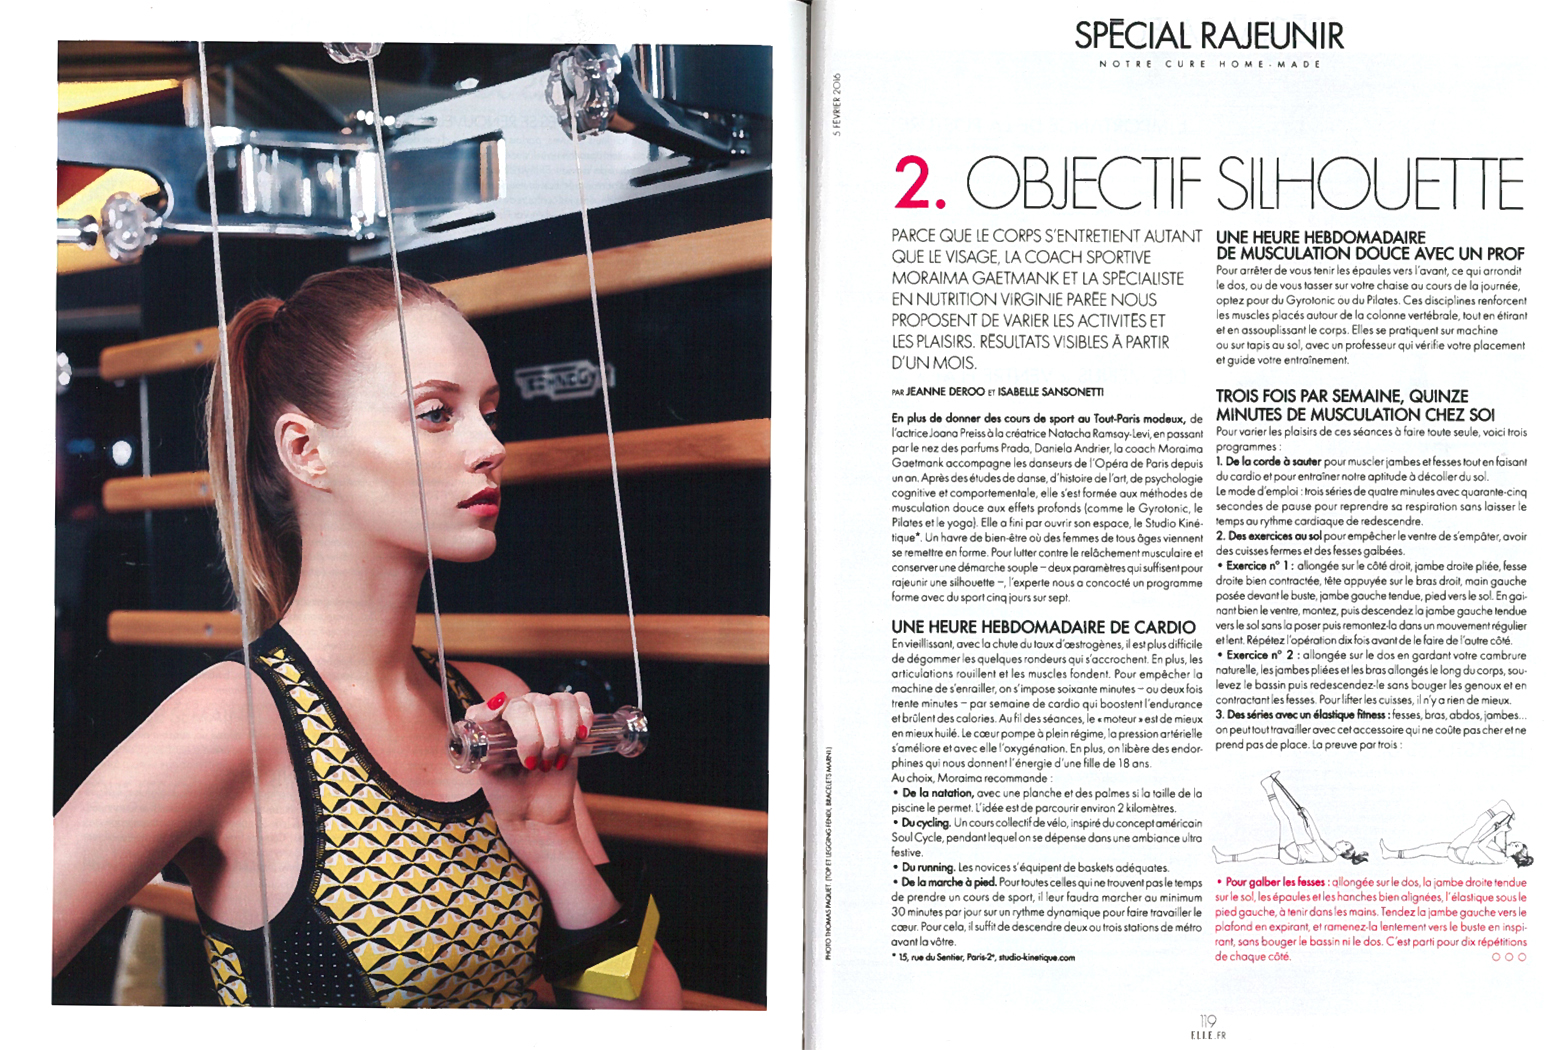 201602-ELLE-magazine-Studio-Kinetique-1.jpg